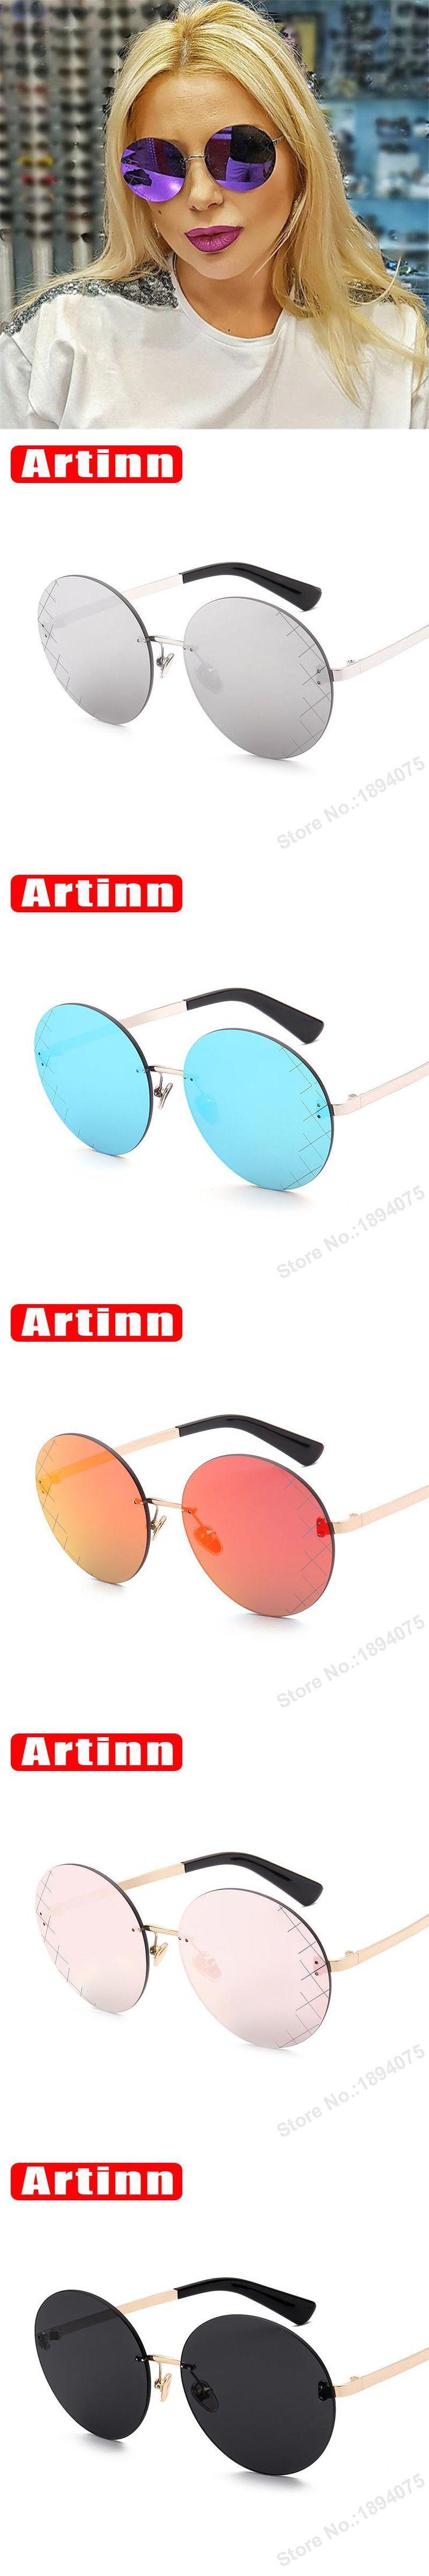 Luxury High quality fashion round mirror sunglasses women brand designer 2017 vintage oversized retro sun glasses 986053Y